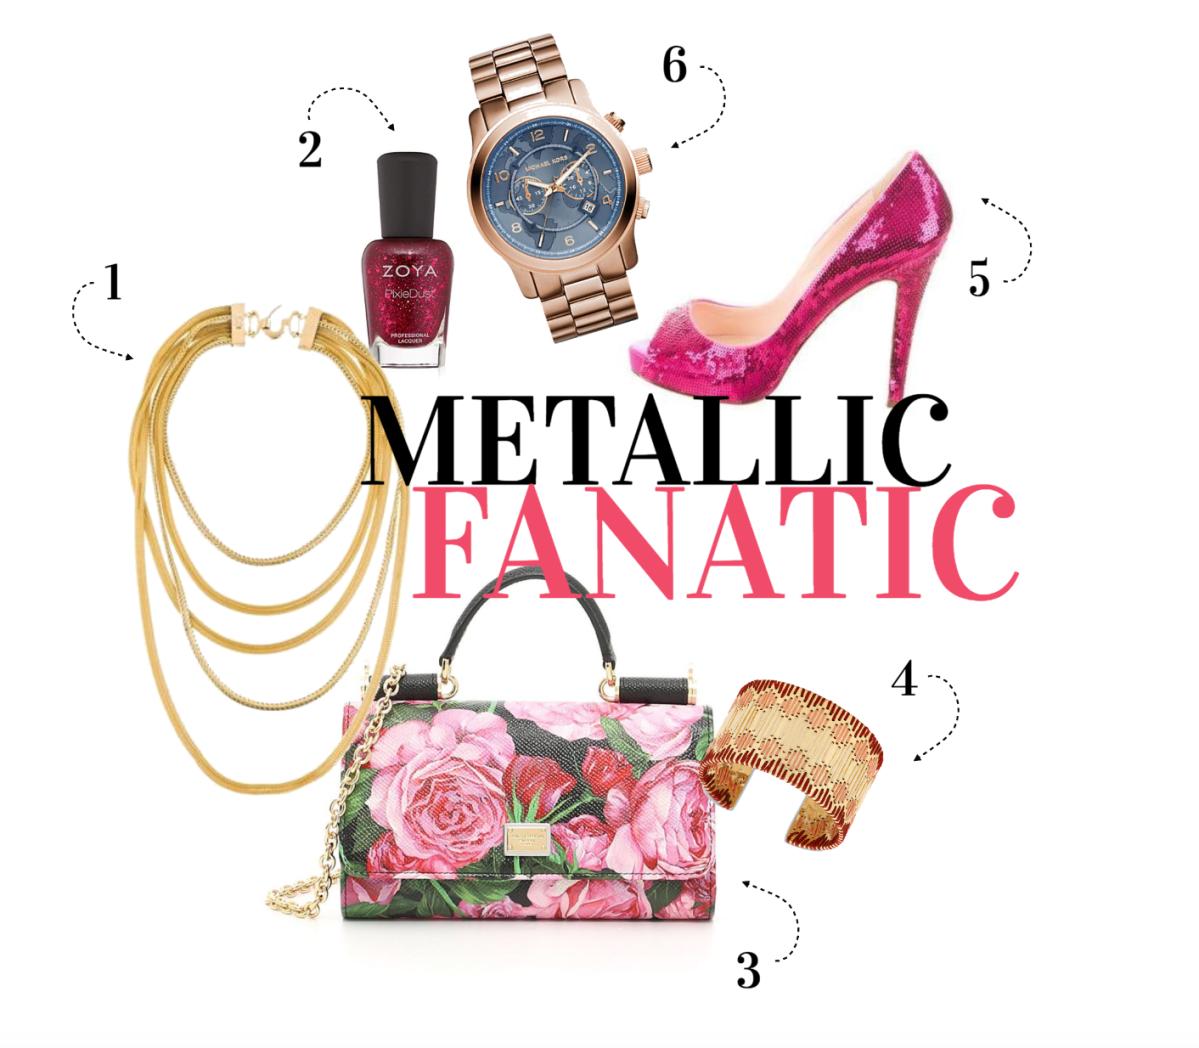 style sheet: metallic fanatic